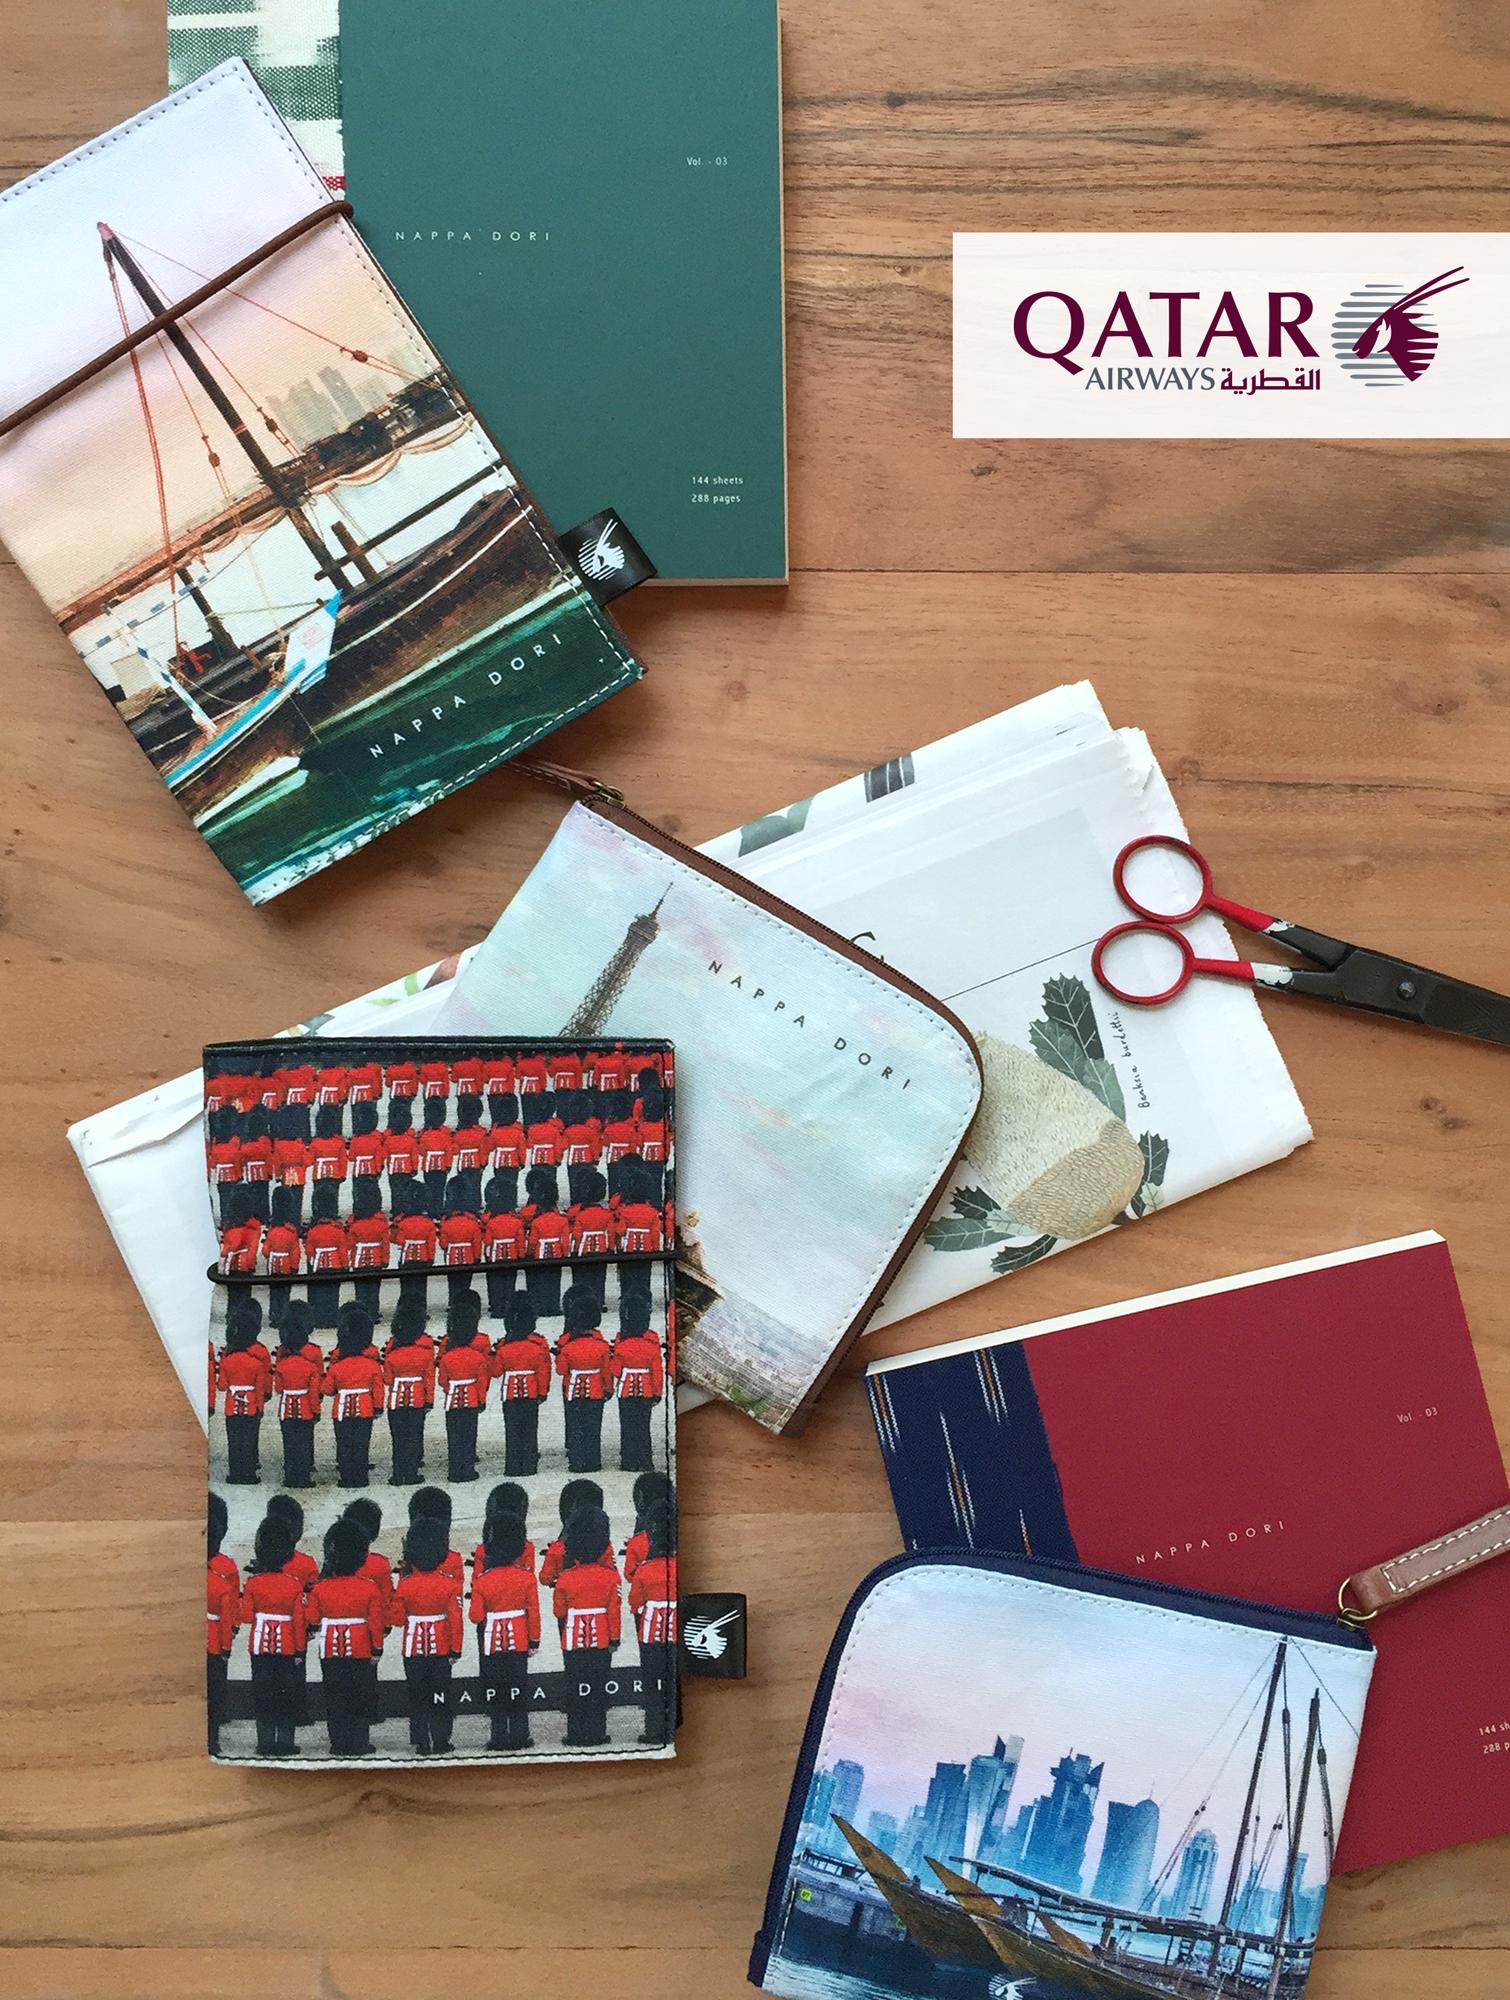 India-Qatar-Airways-Nappa-Dori